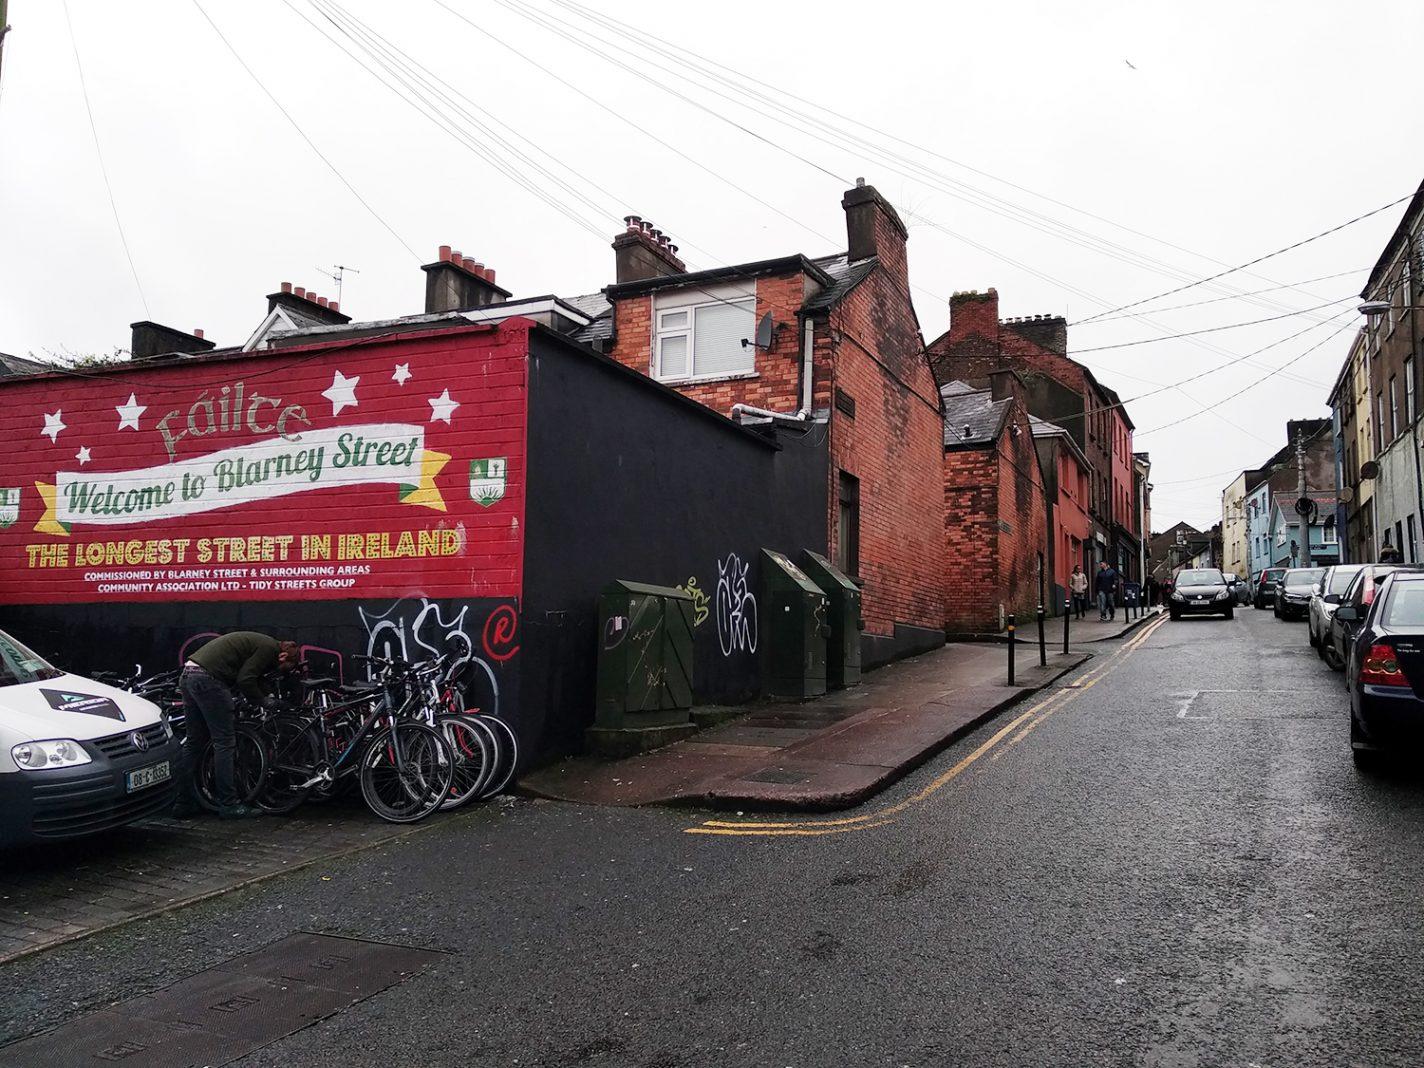 Blarney Street - de langste straat van Ierland - stedentrip Cork